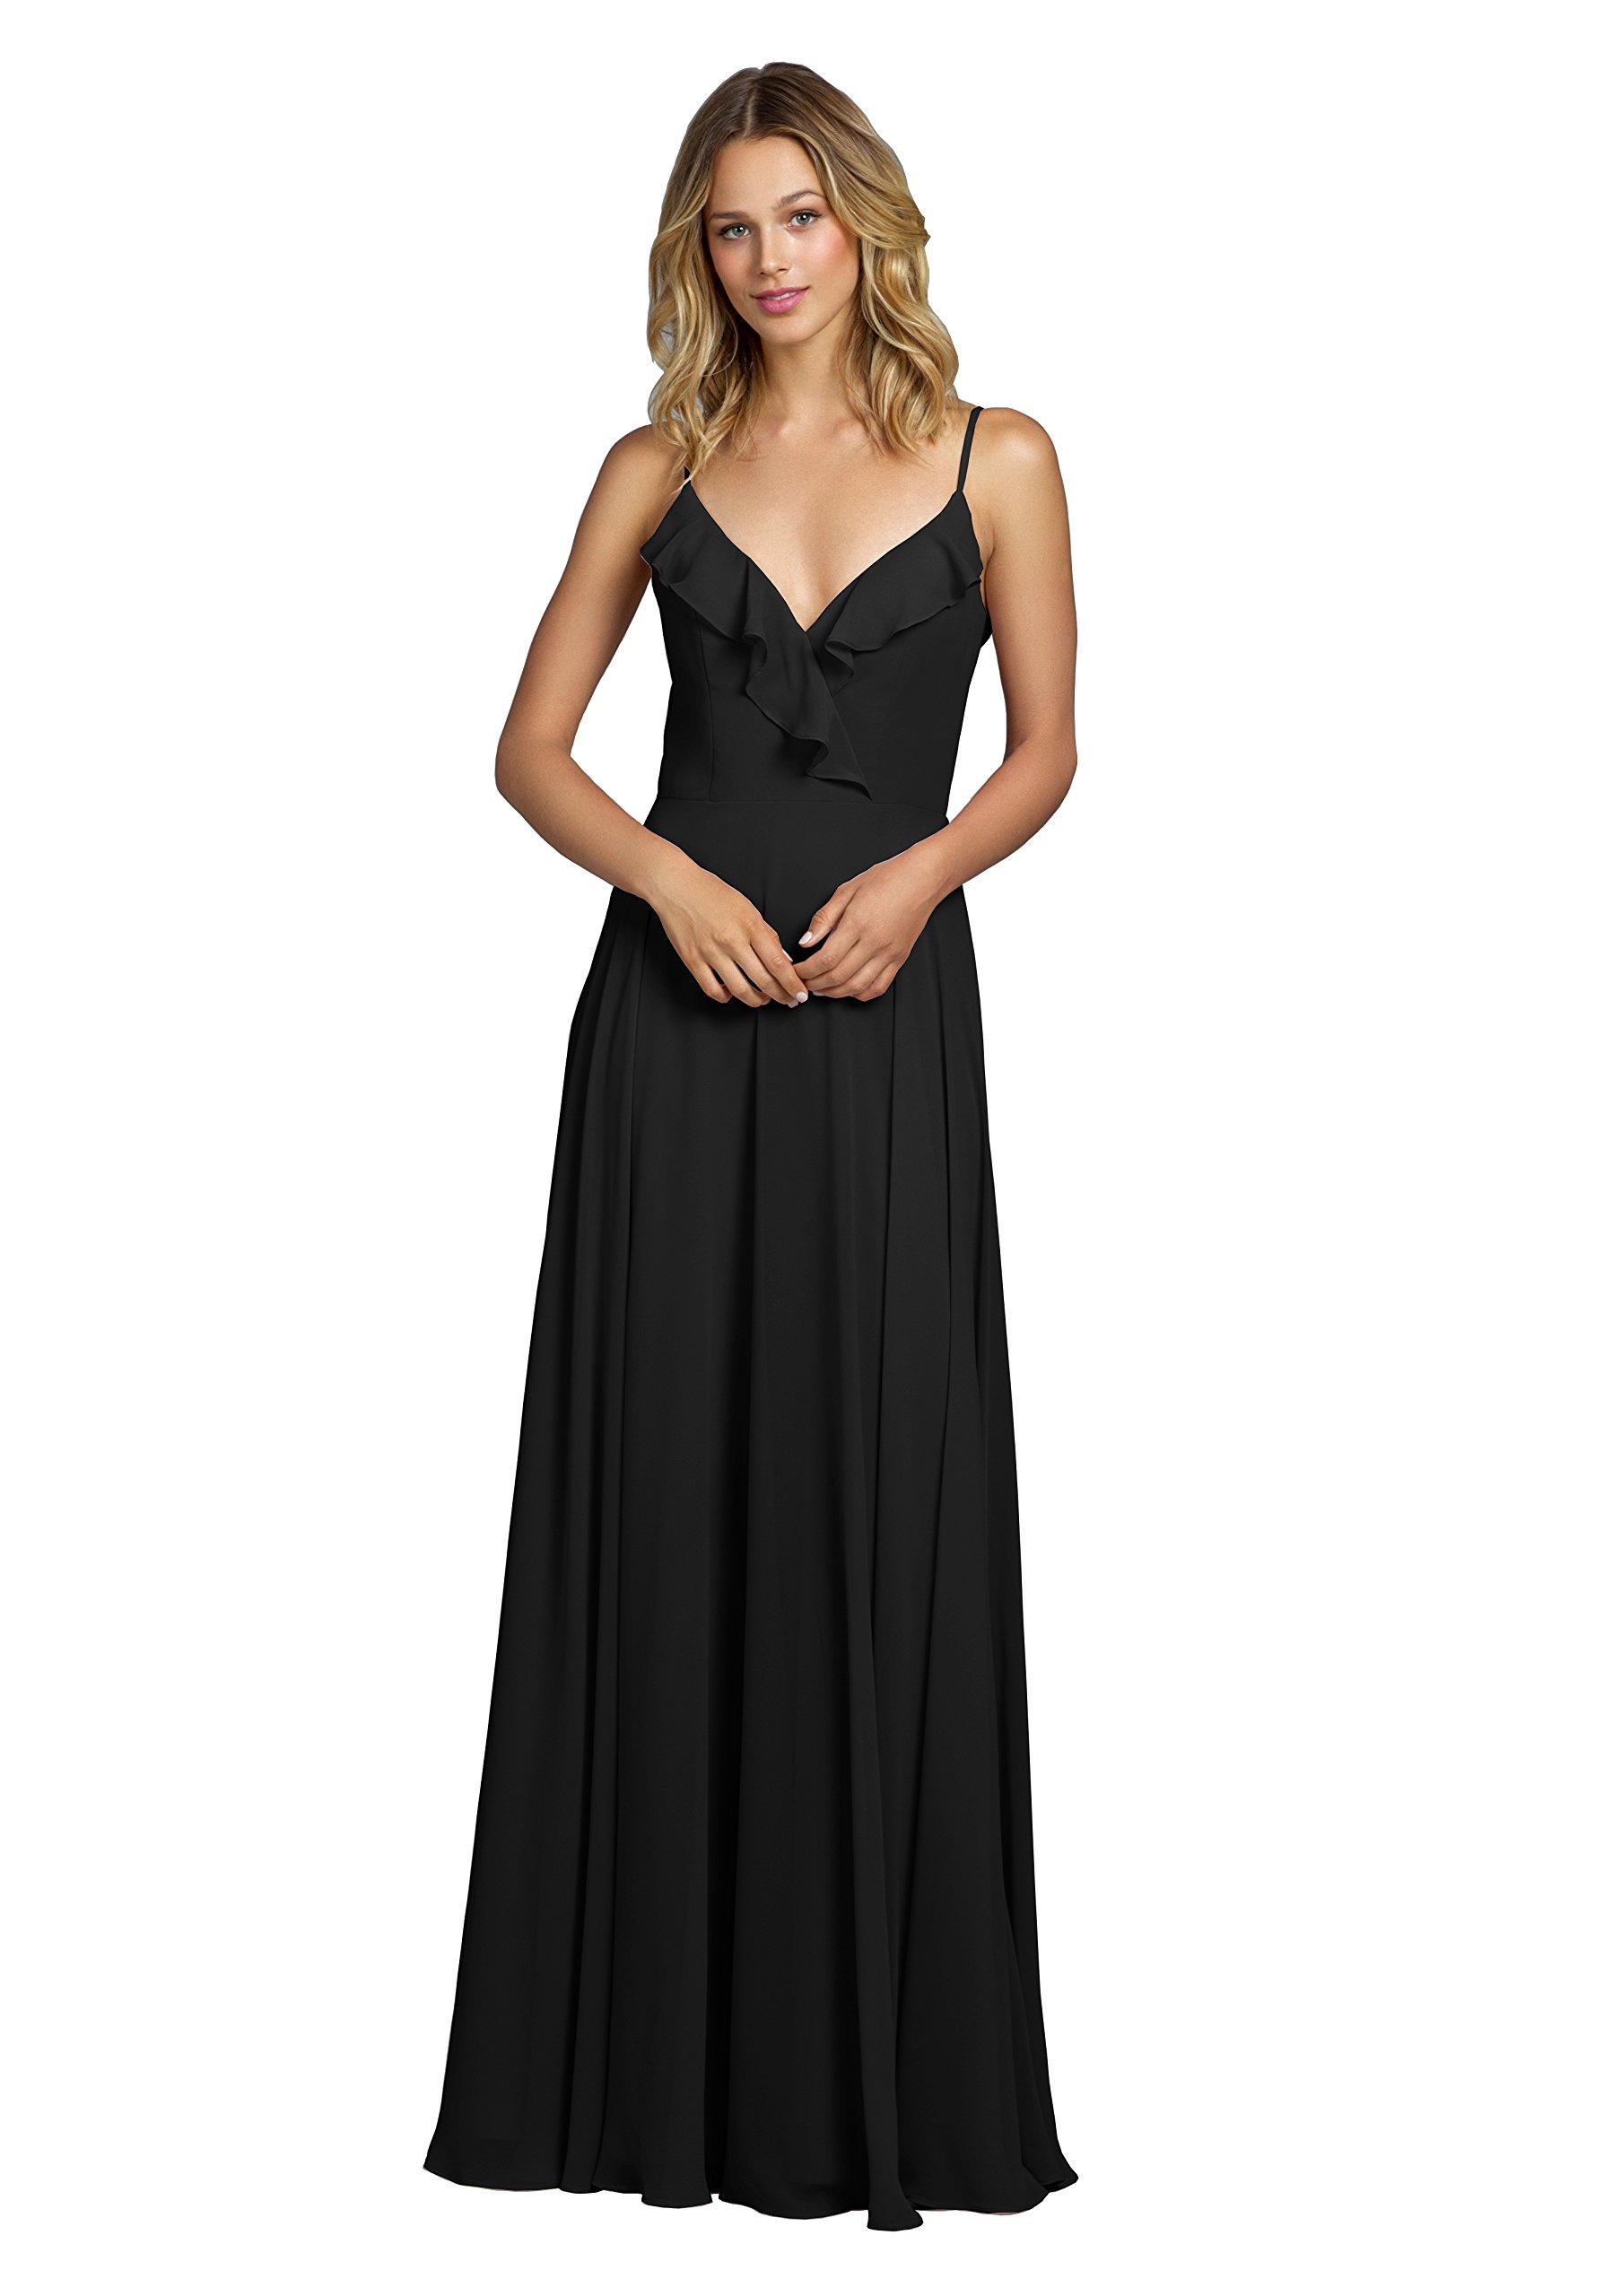 YORFORMALS V-Neck Chiffon Plus Size Evening Dress Long Ruffle Neckline  Formal Party Gown Size 28 Black